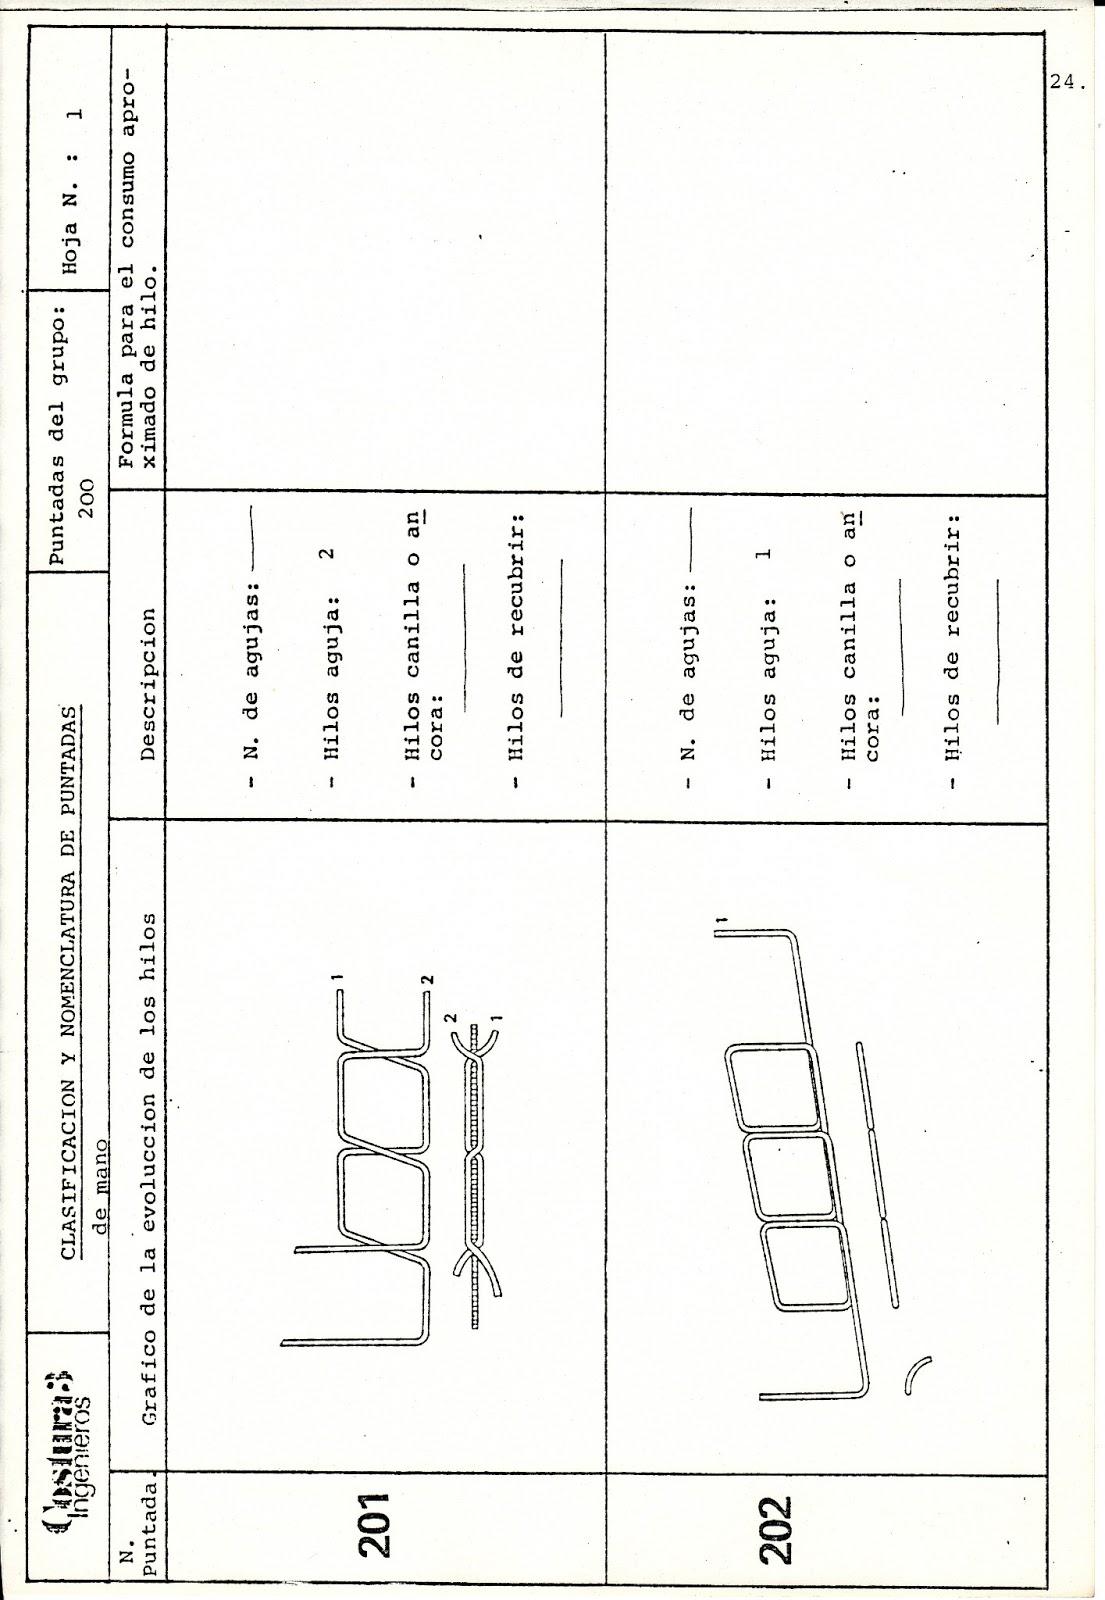 COSTURA Y MAQUINA empfehlungsbonus williamhill williamhill desktop-login DE COSER: williamhill live-streaming-boxen Puntadas costuras en máquinas de coser